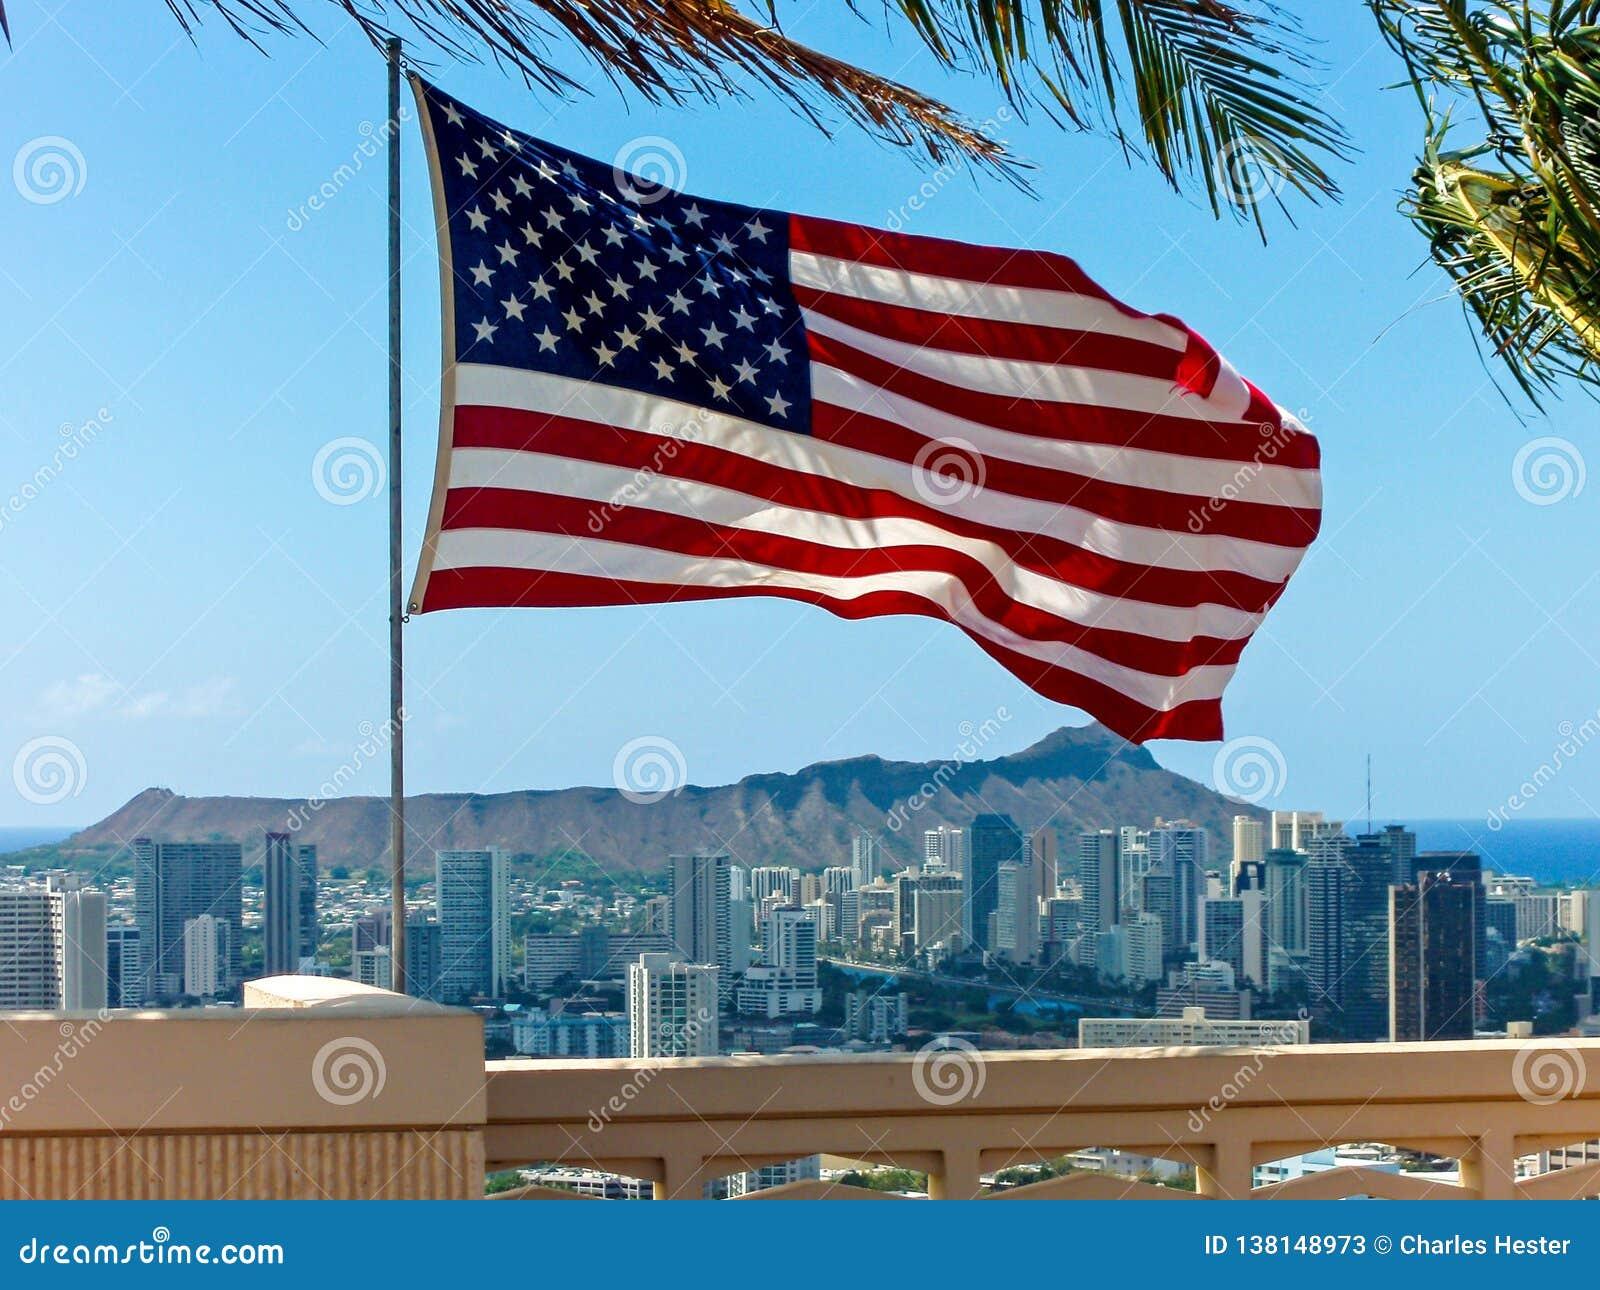 American flag punchbowl